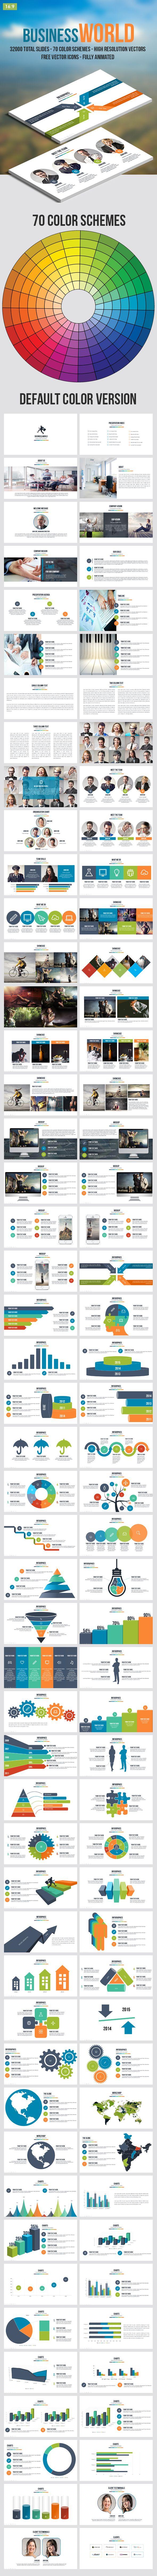 Business World Keynote Presentation - Business Keynote Templates